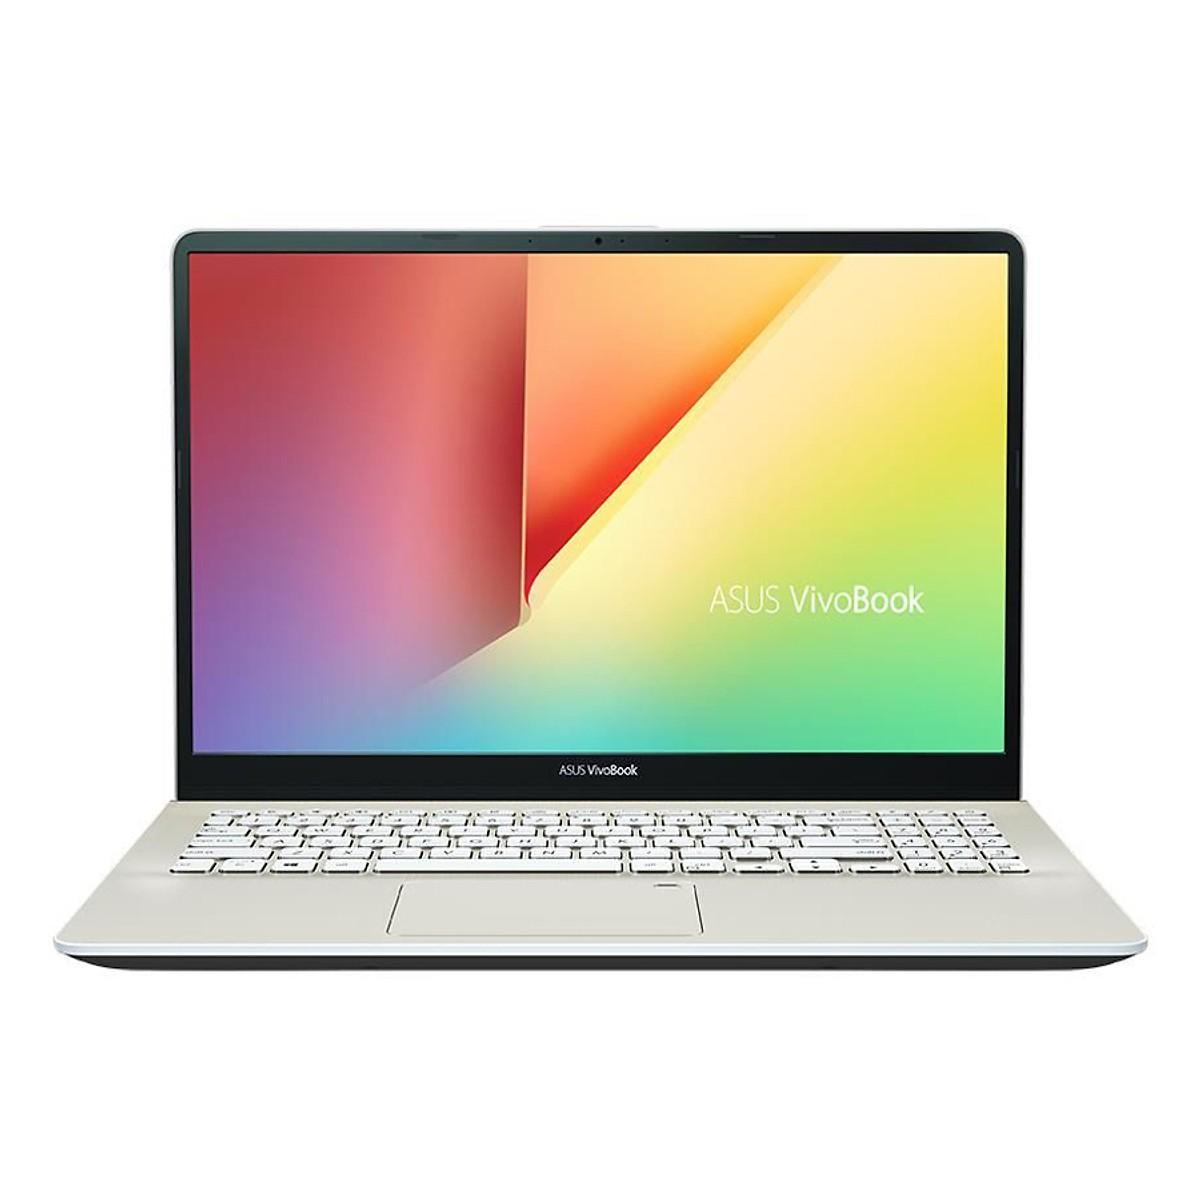 Laptop Asus Vivobook S15 S530UN-BQ028T Core i7-8550U/ Win10 (15.6 inch FHD IPS)